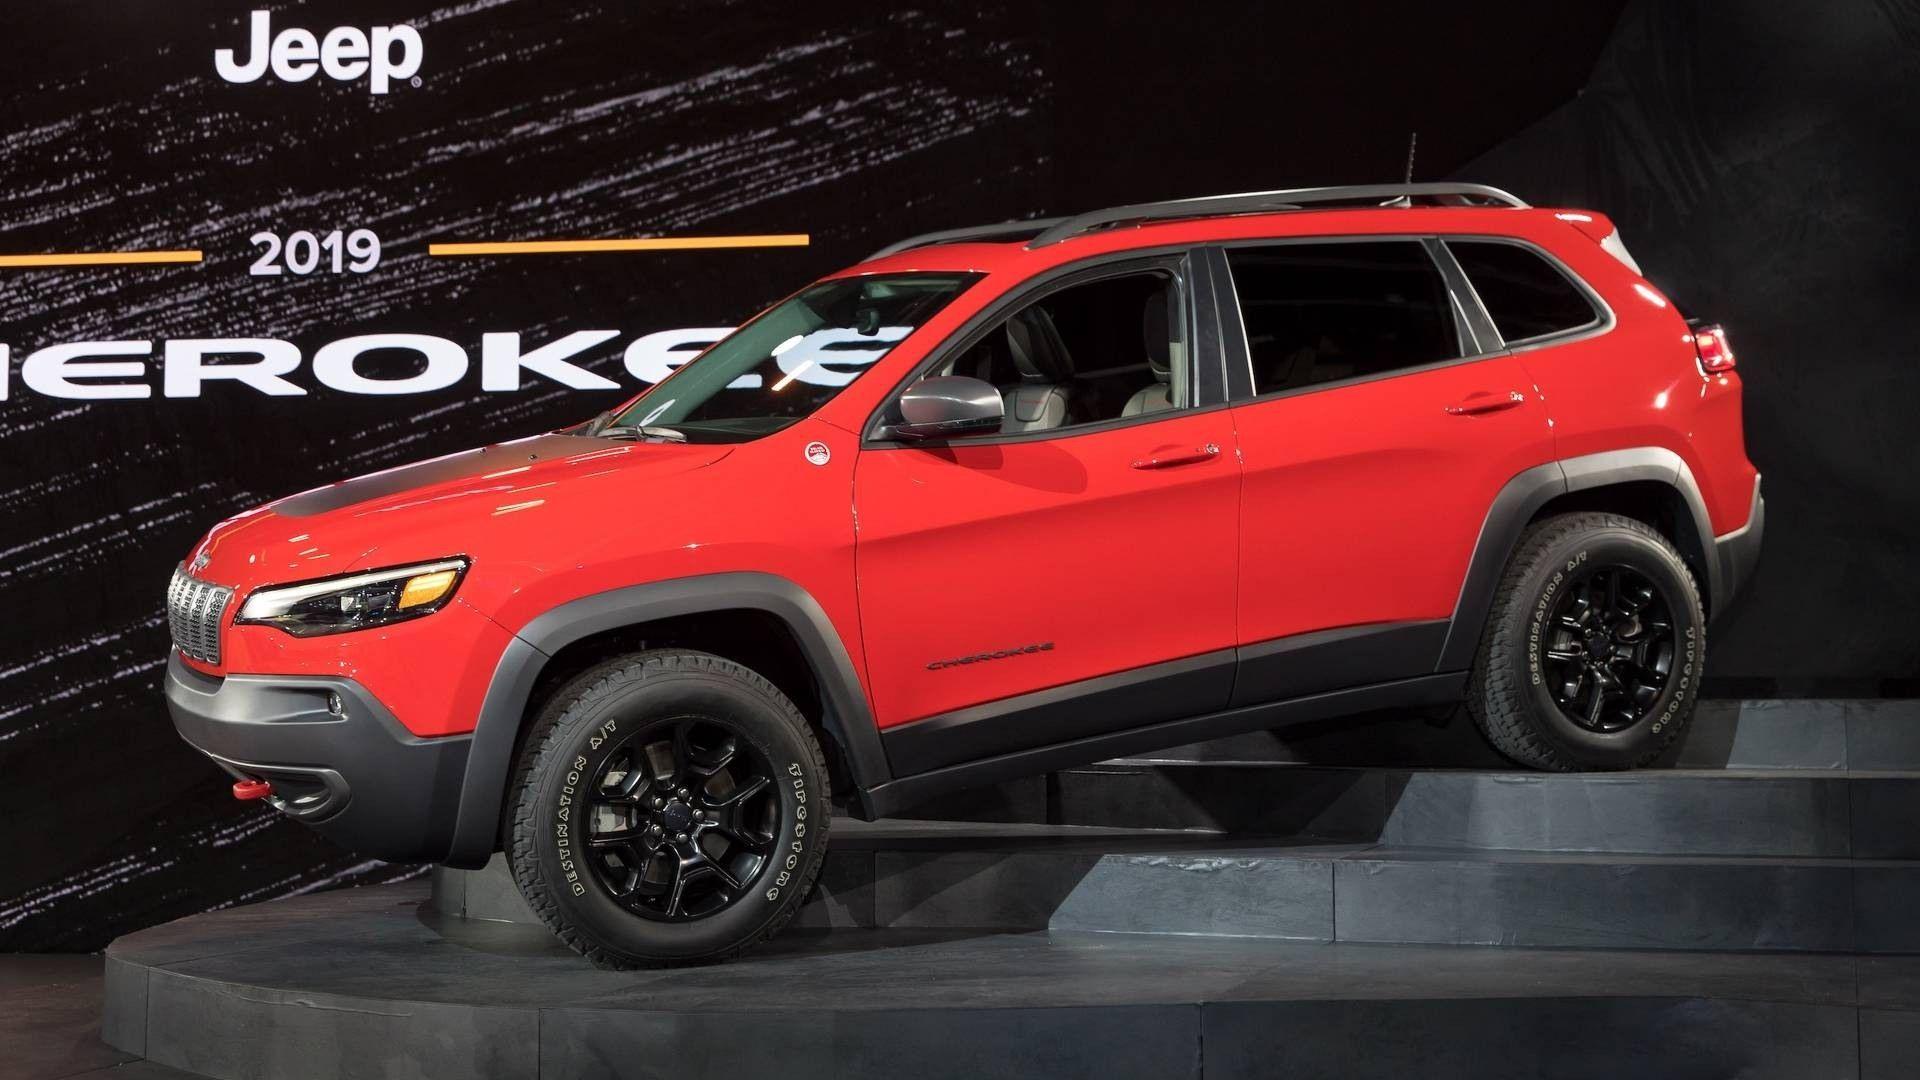 Jeep Cherokee 2019 Interior Jeep, Jeep cherokee sport